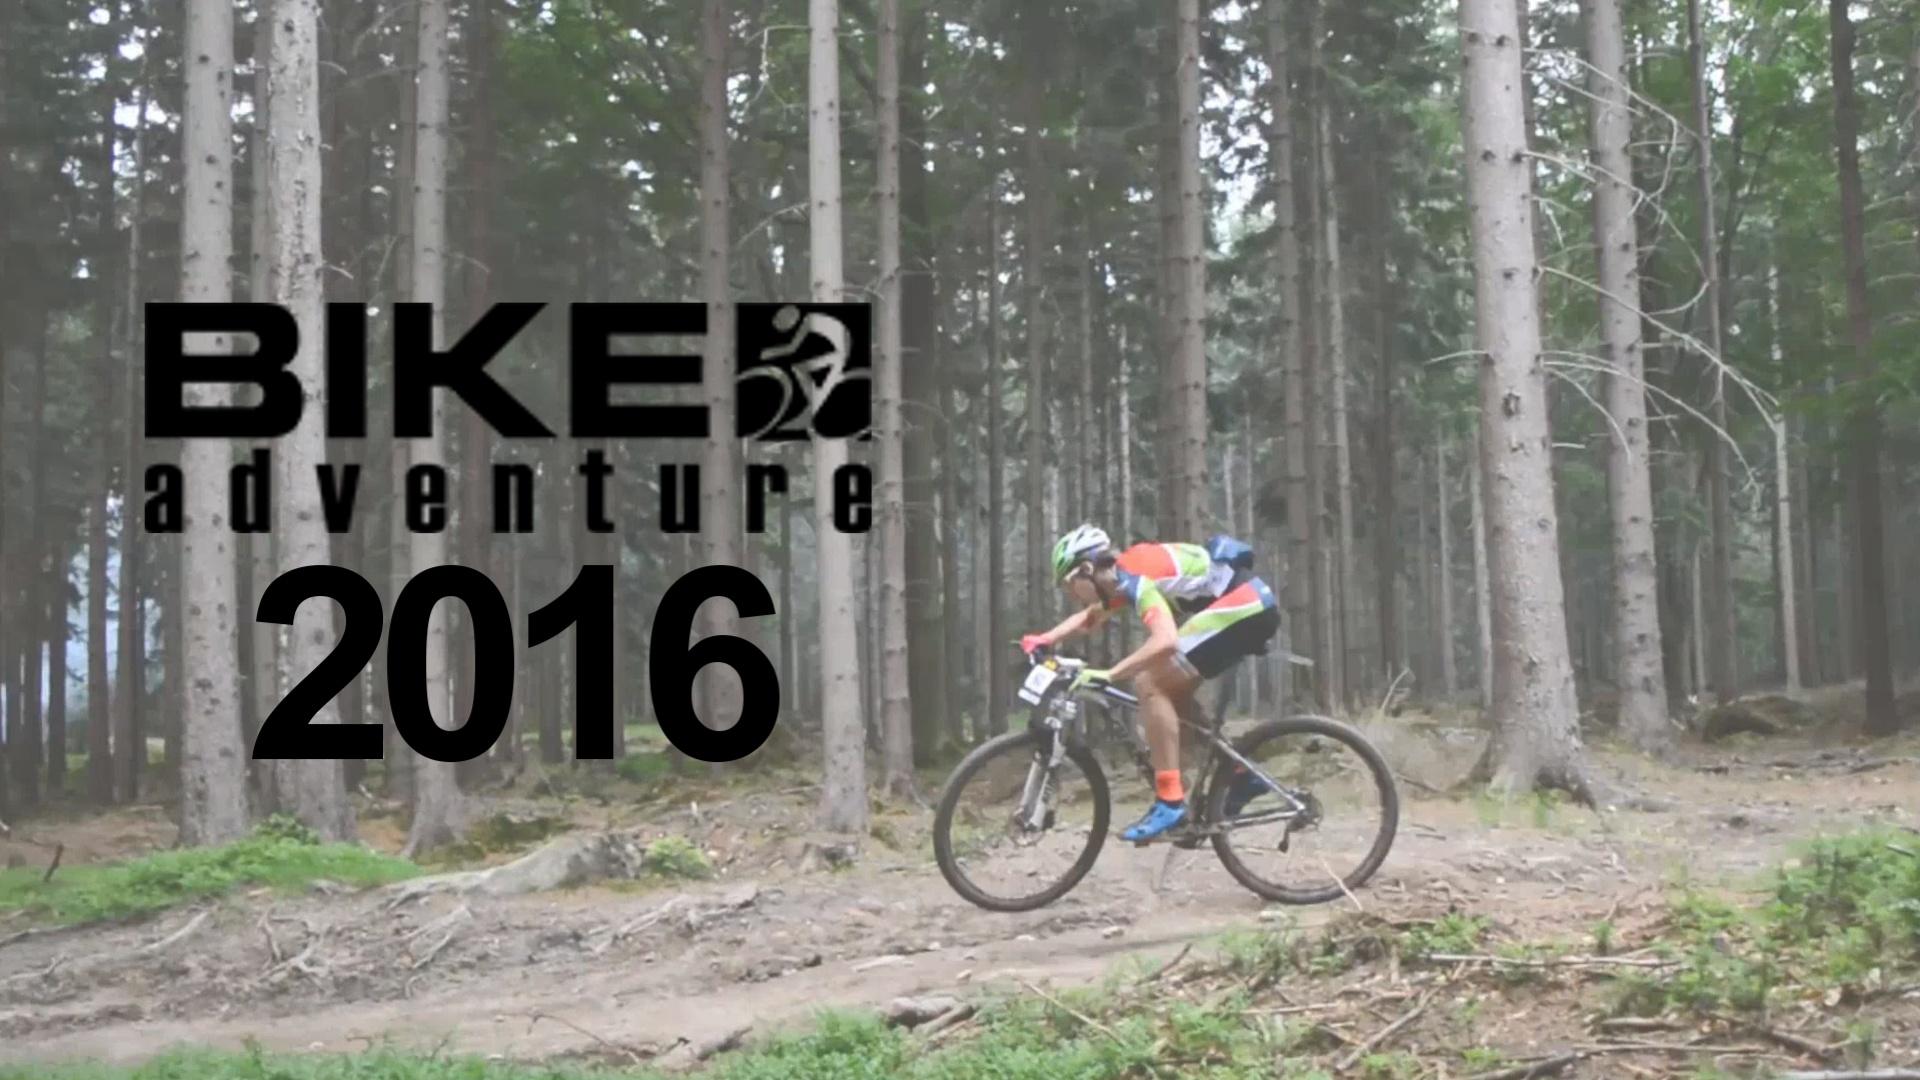 Bike Adventure, Szklarska Poręba 2016 [wideo]